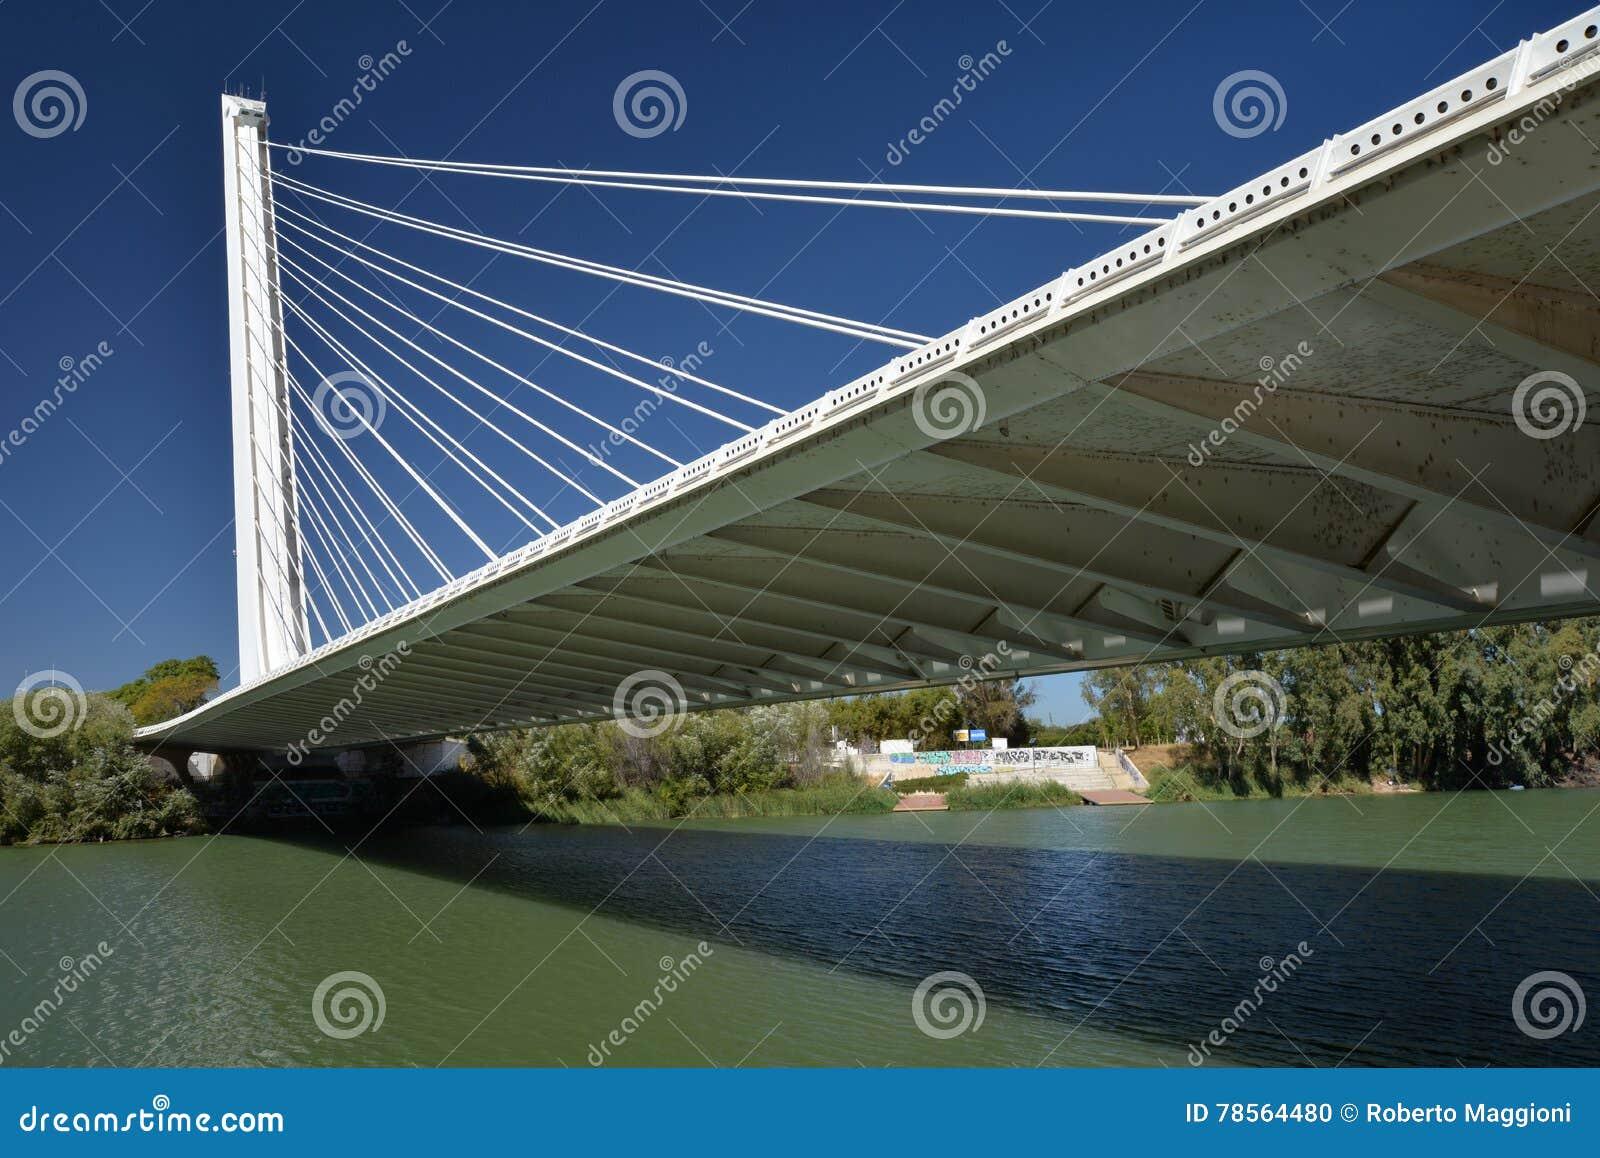 Seville, Andalusia, Spain. Alamillo bridge by architect Santiago Calatrava